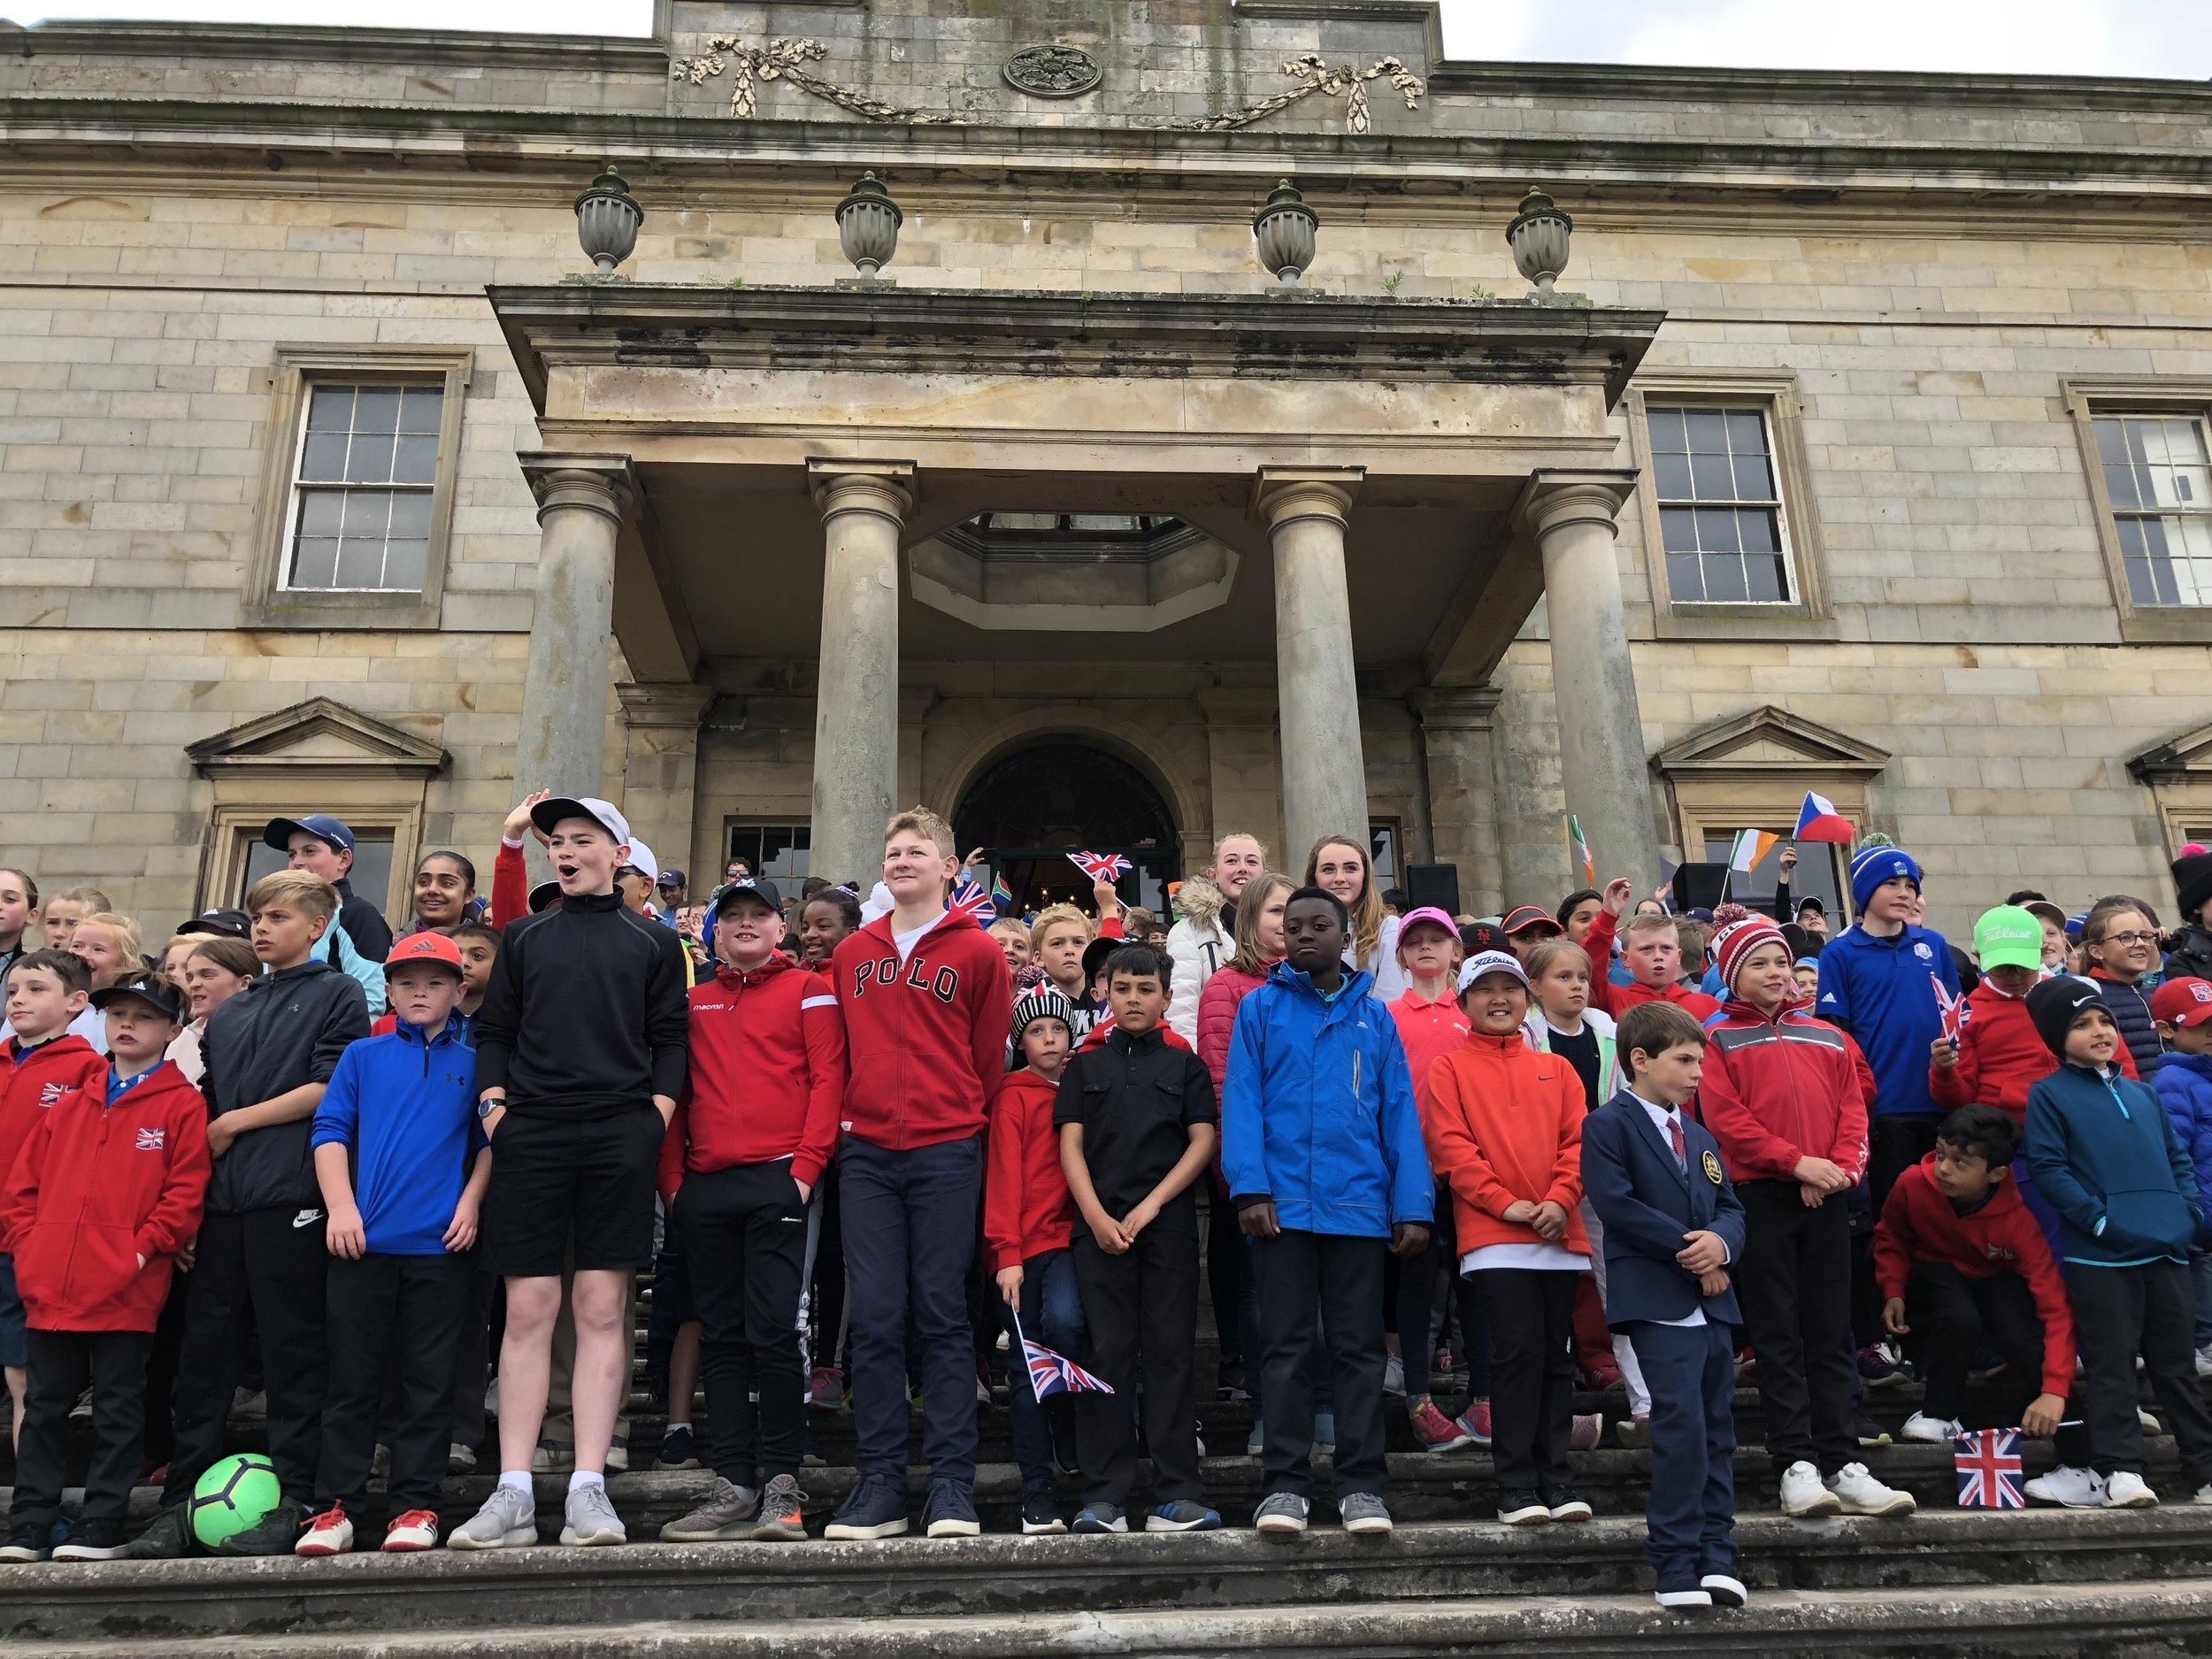 2019 European Championship Opening Ceremony Gosford House St Lothian